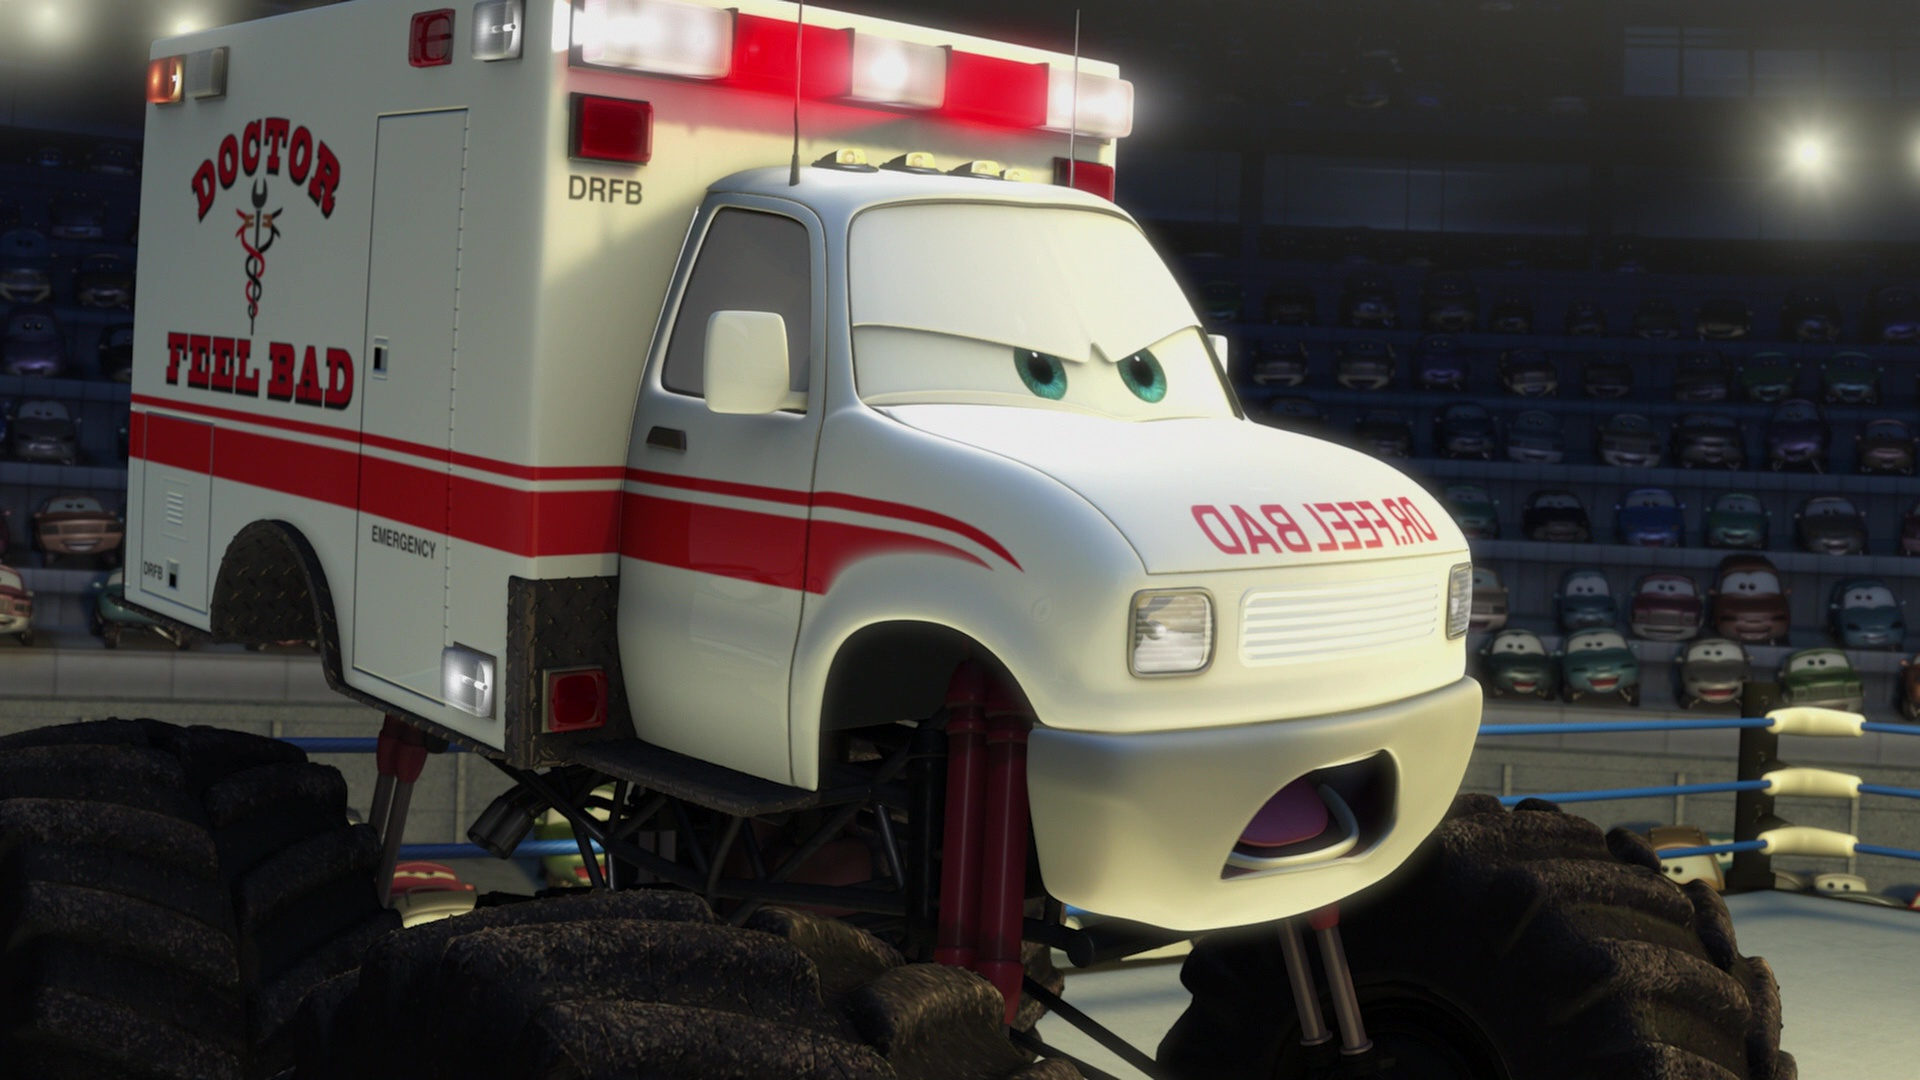 docteur-feel-bad-cars-toon-martin-poids-lourd-01